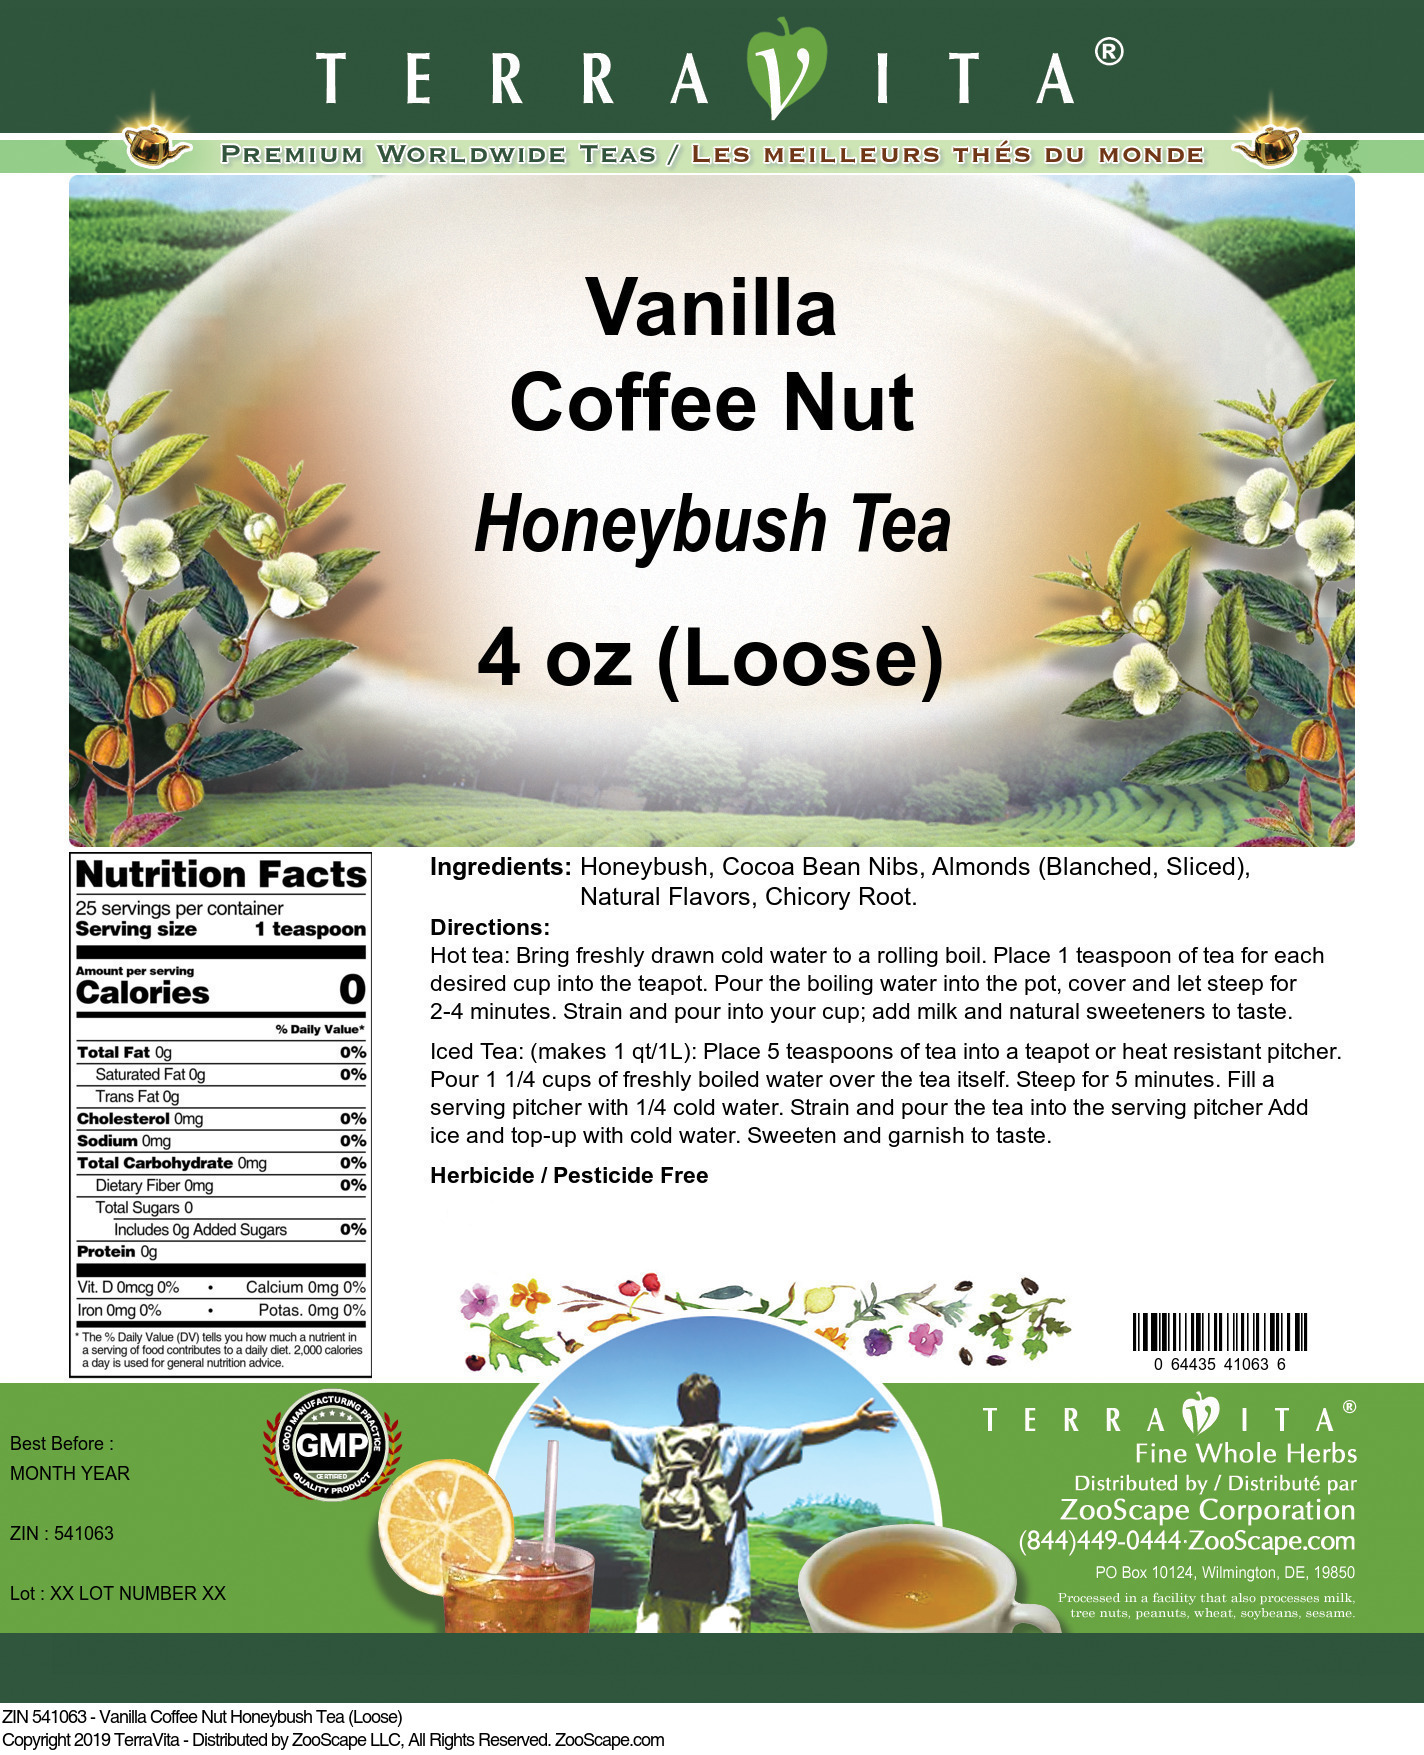 Vanilla Coffee Nut Honeybush Tea (Loose)